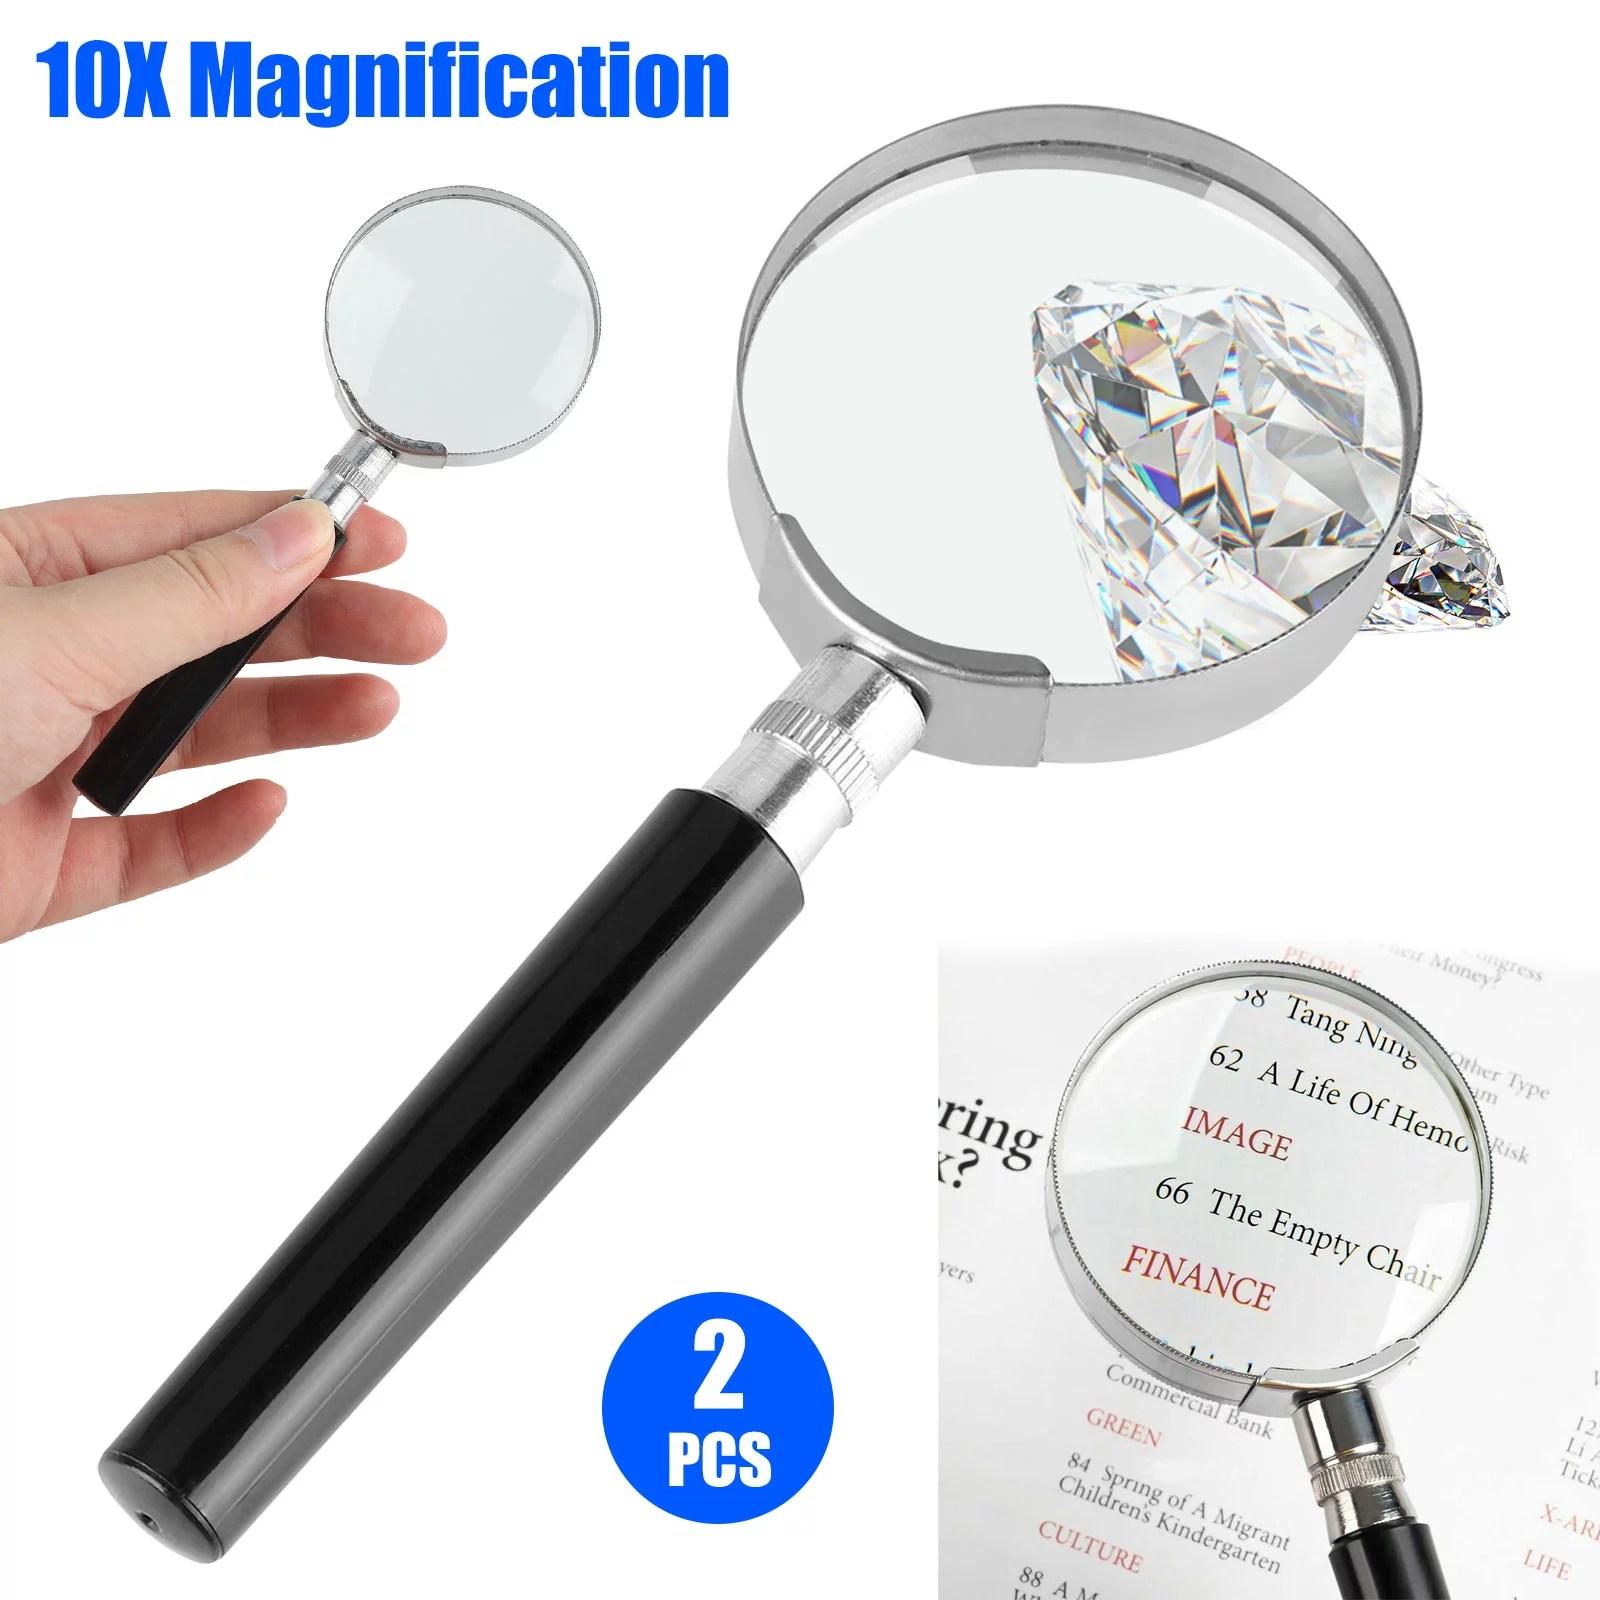 Tsv 2pcs Magnifying Glass 10x Handheld Reading Magnifier